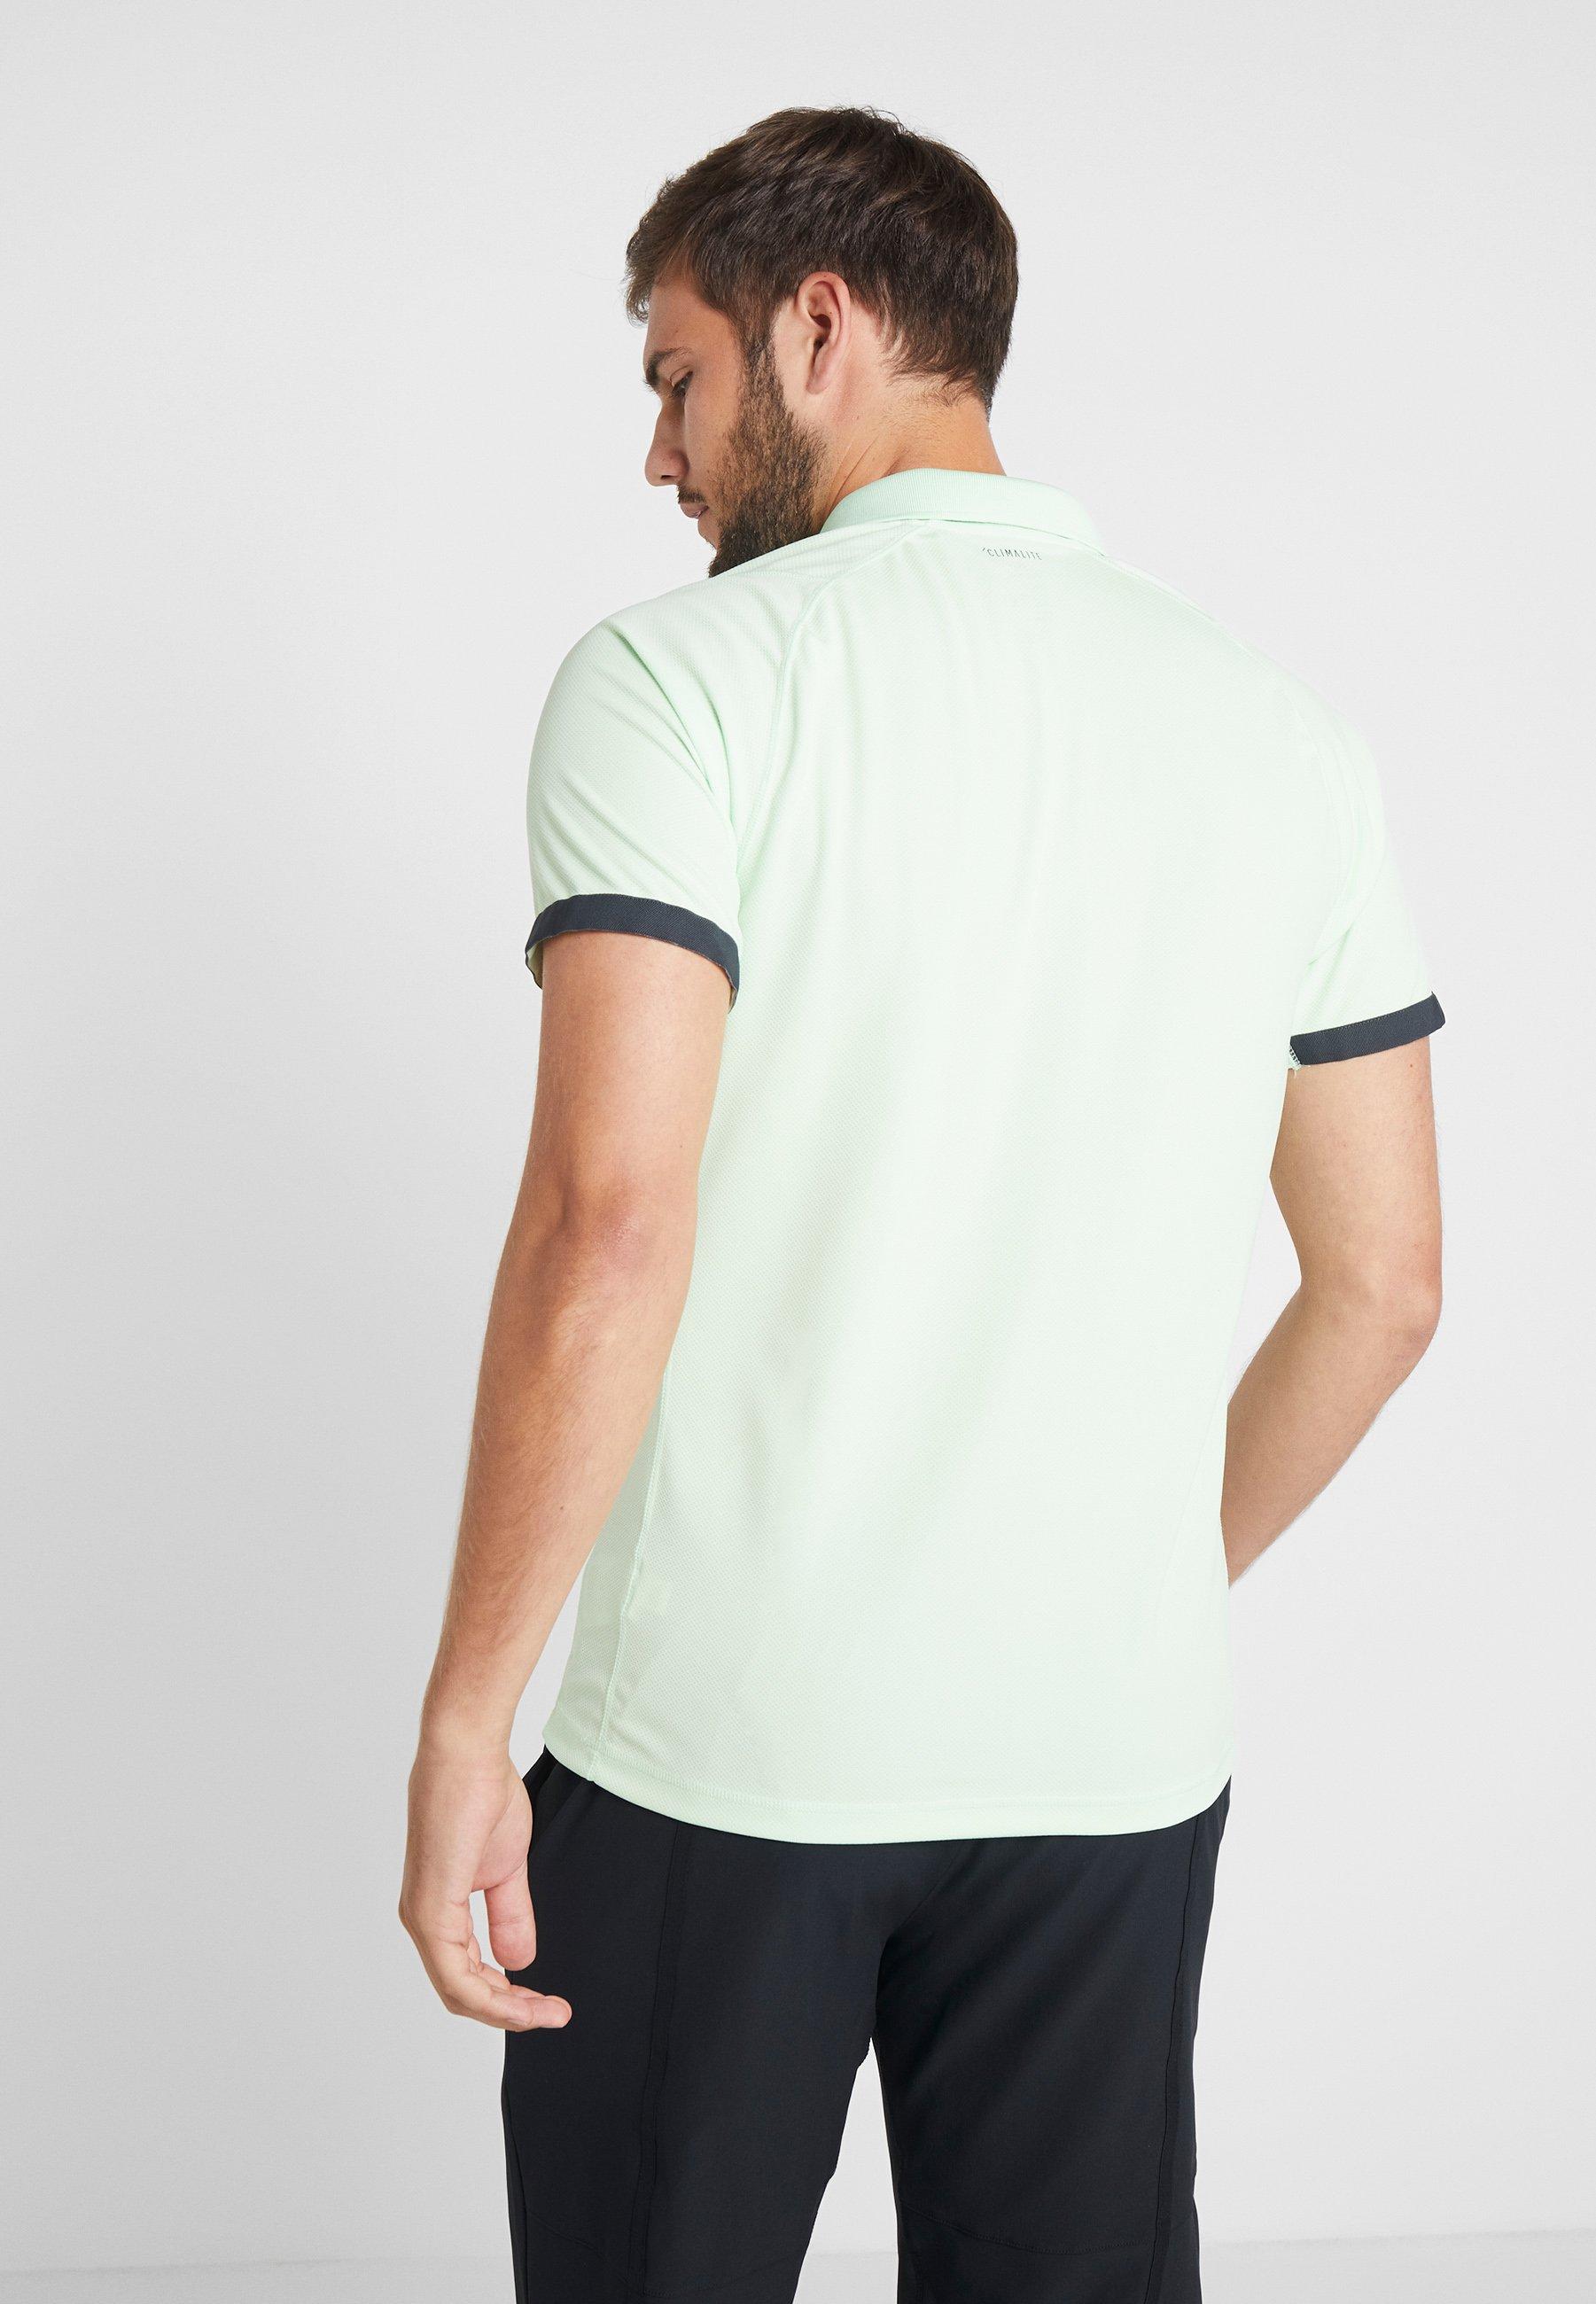 De SportGlow Performance T Green carbon Adidas shirt TcFK1l3uJ